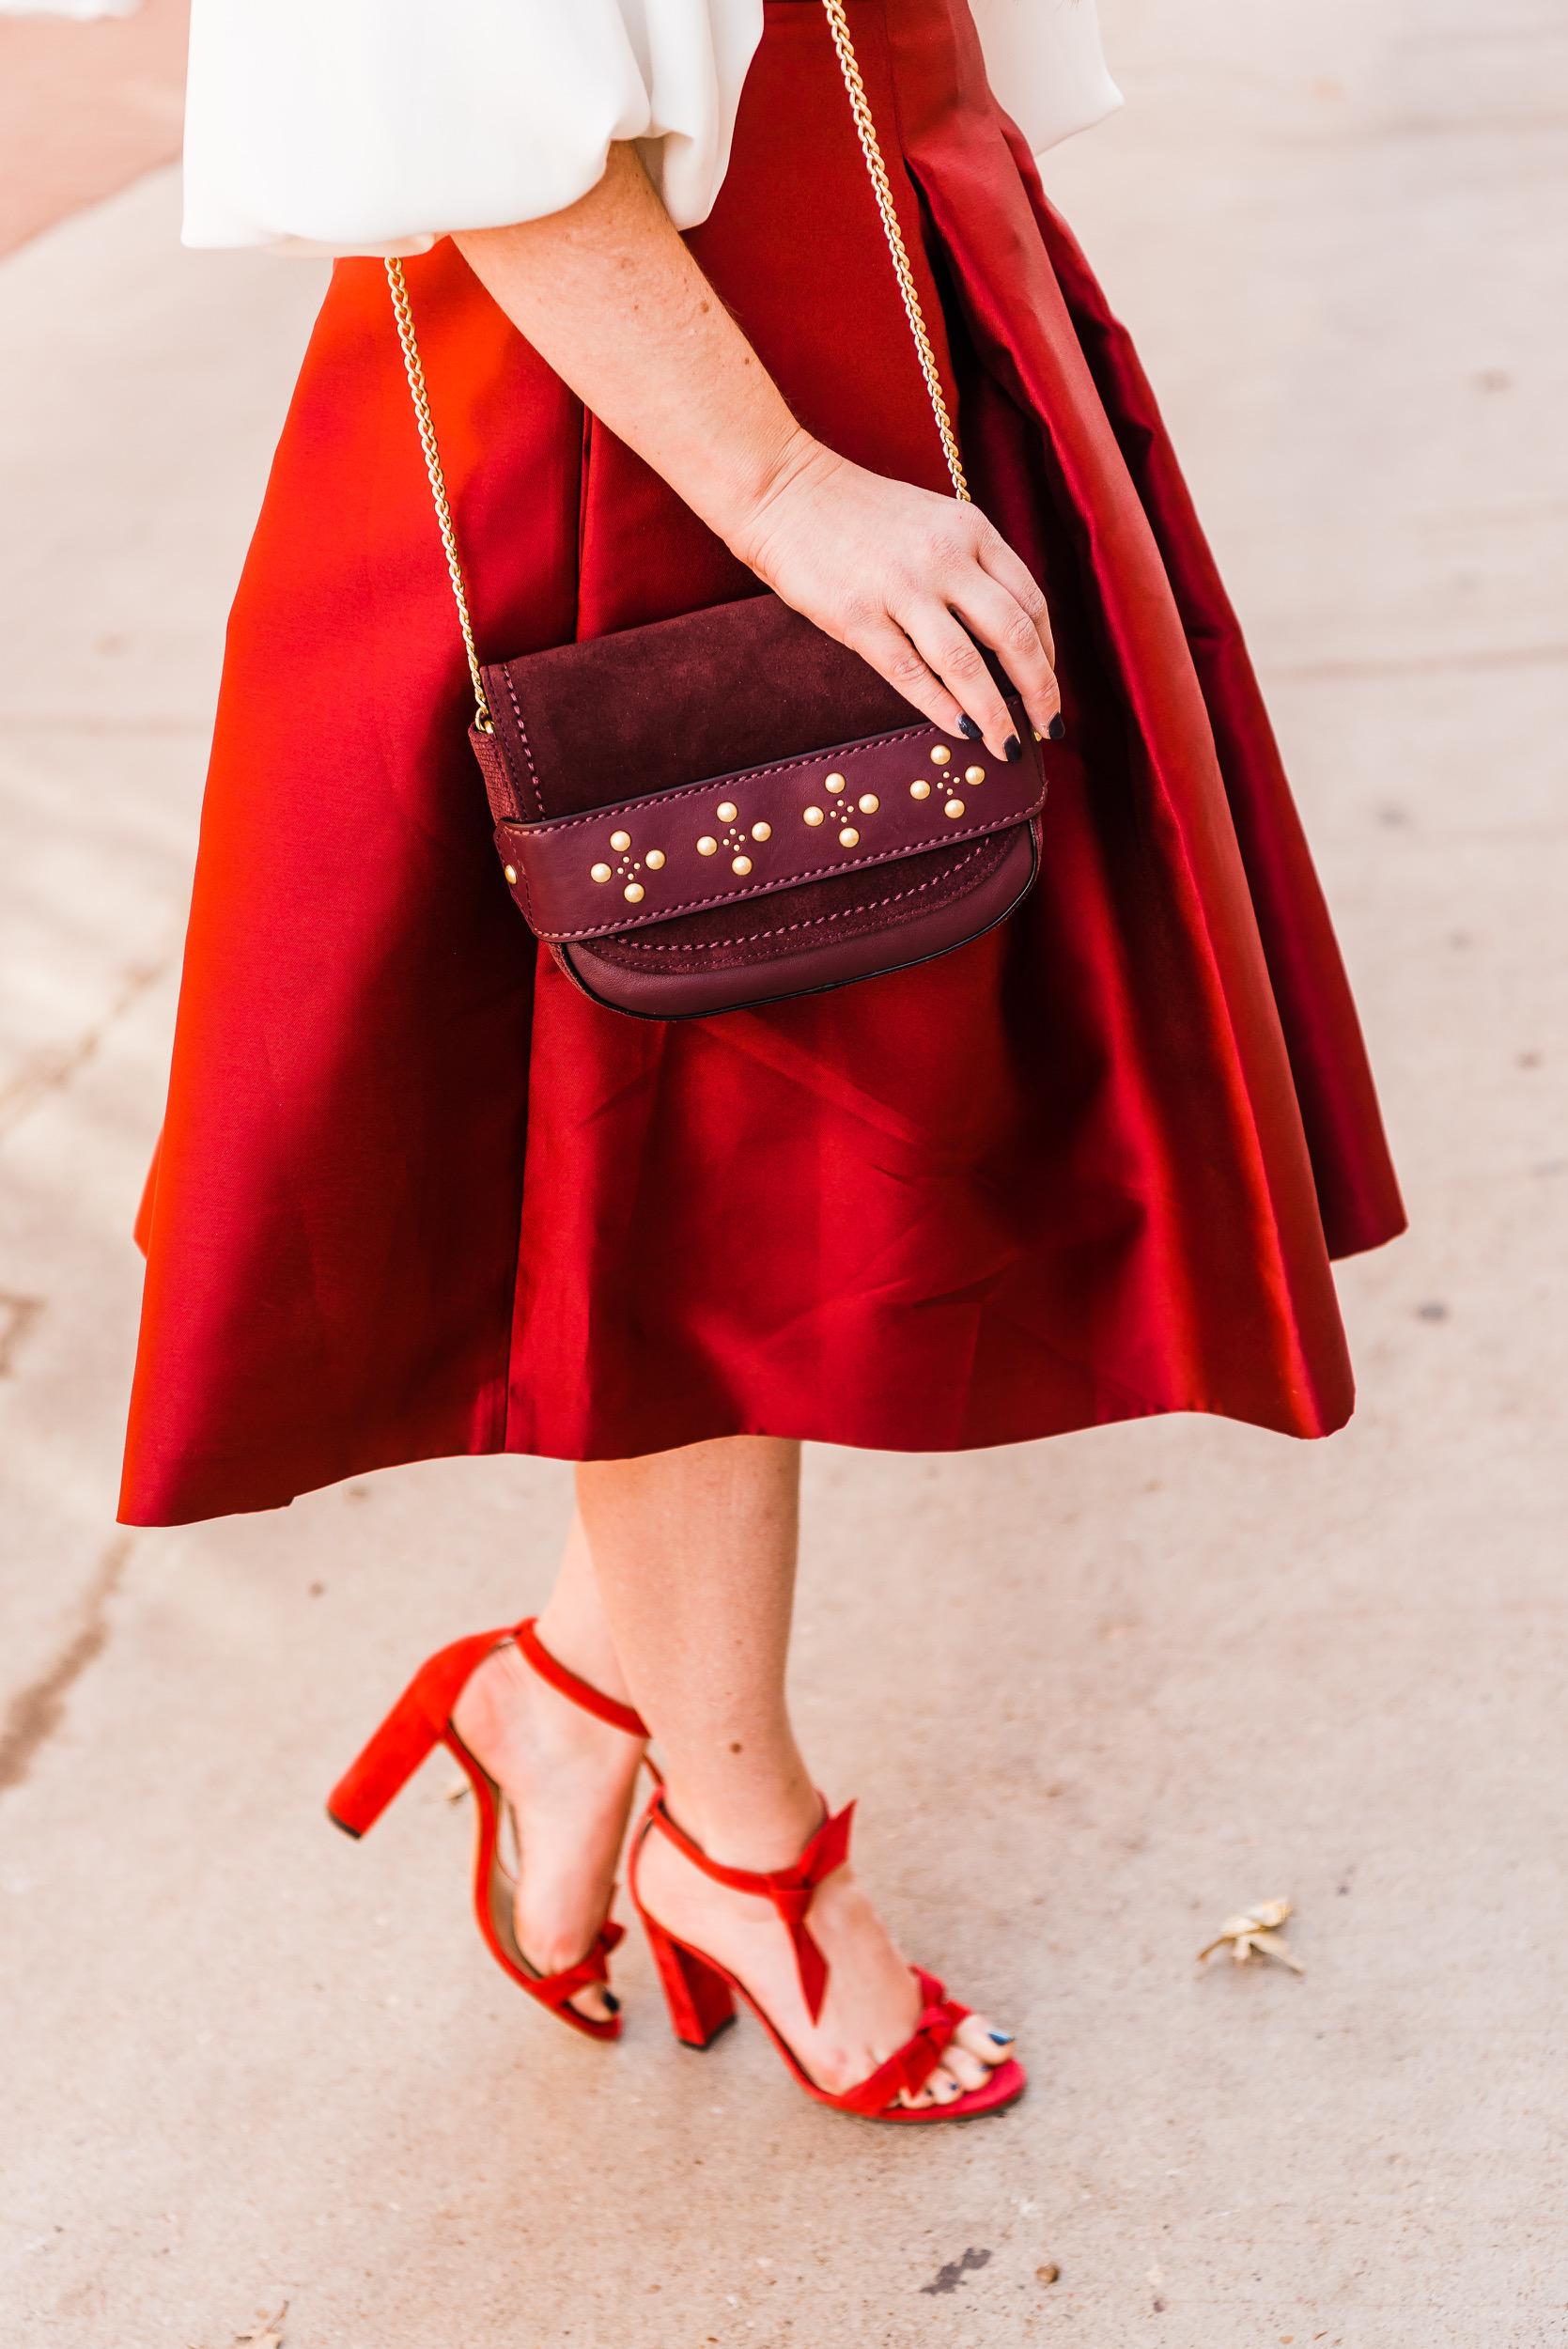 Crossbody Vera Bradley Bag by popular East Memphis fashion blogger Walking in Memphis in High Heels